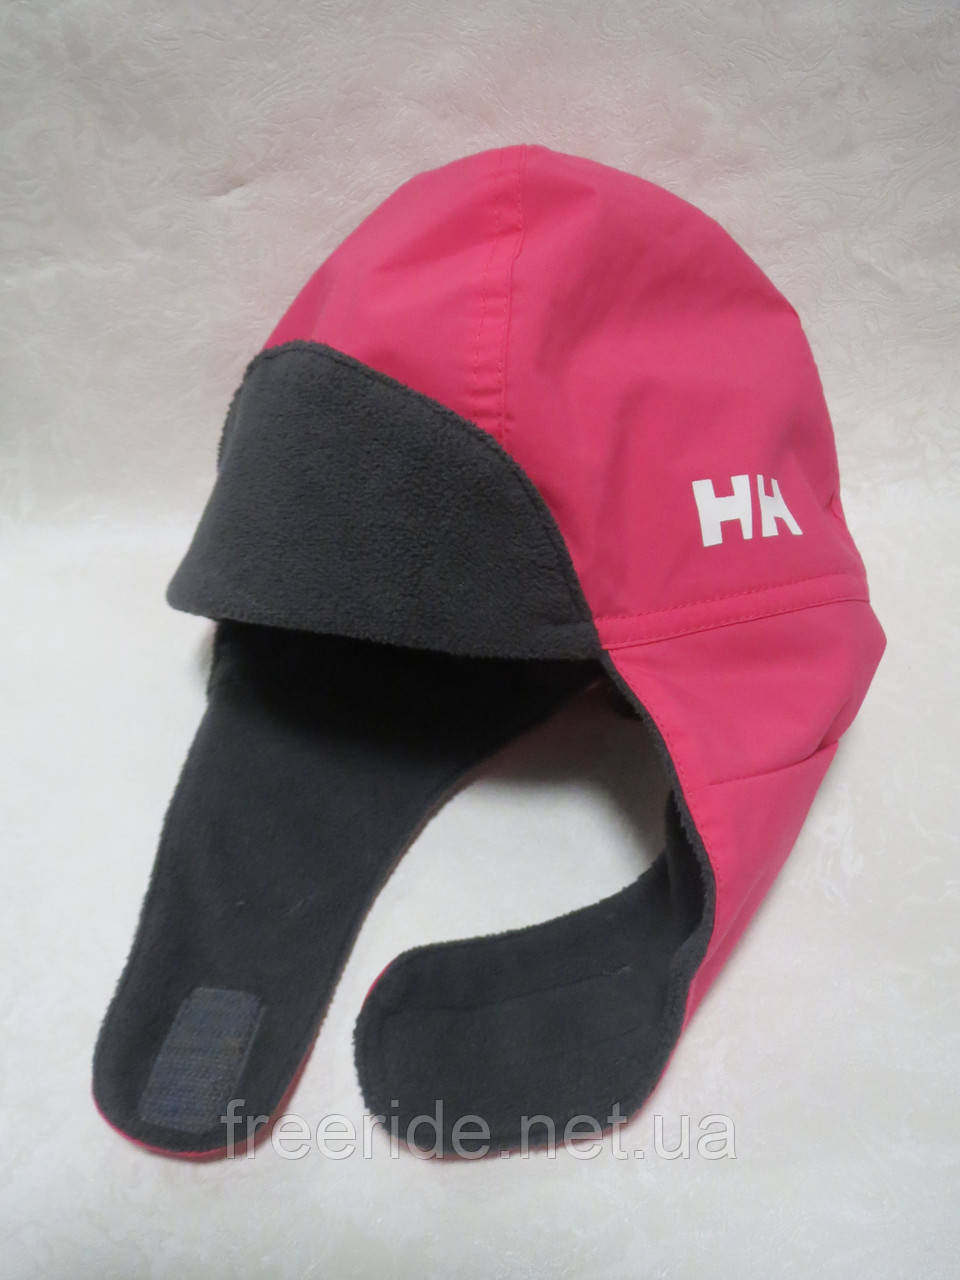 Детская лыжная шапка Helly Hansen (53/54) Polartec